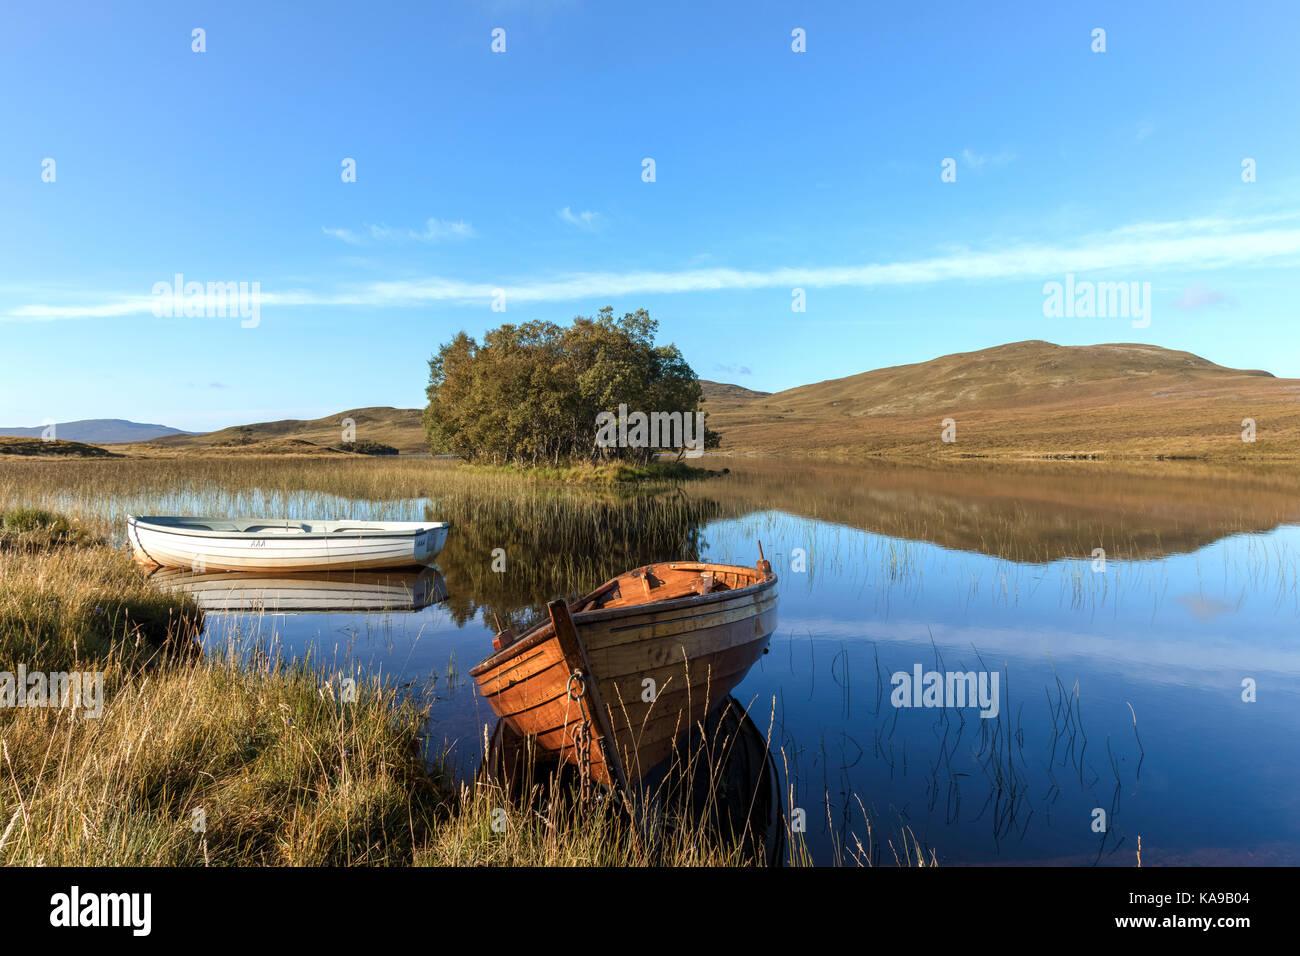 Loch Awe, Assynt, Sutherland, Scotland, United Kingdom - Stock Image